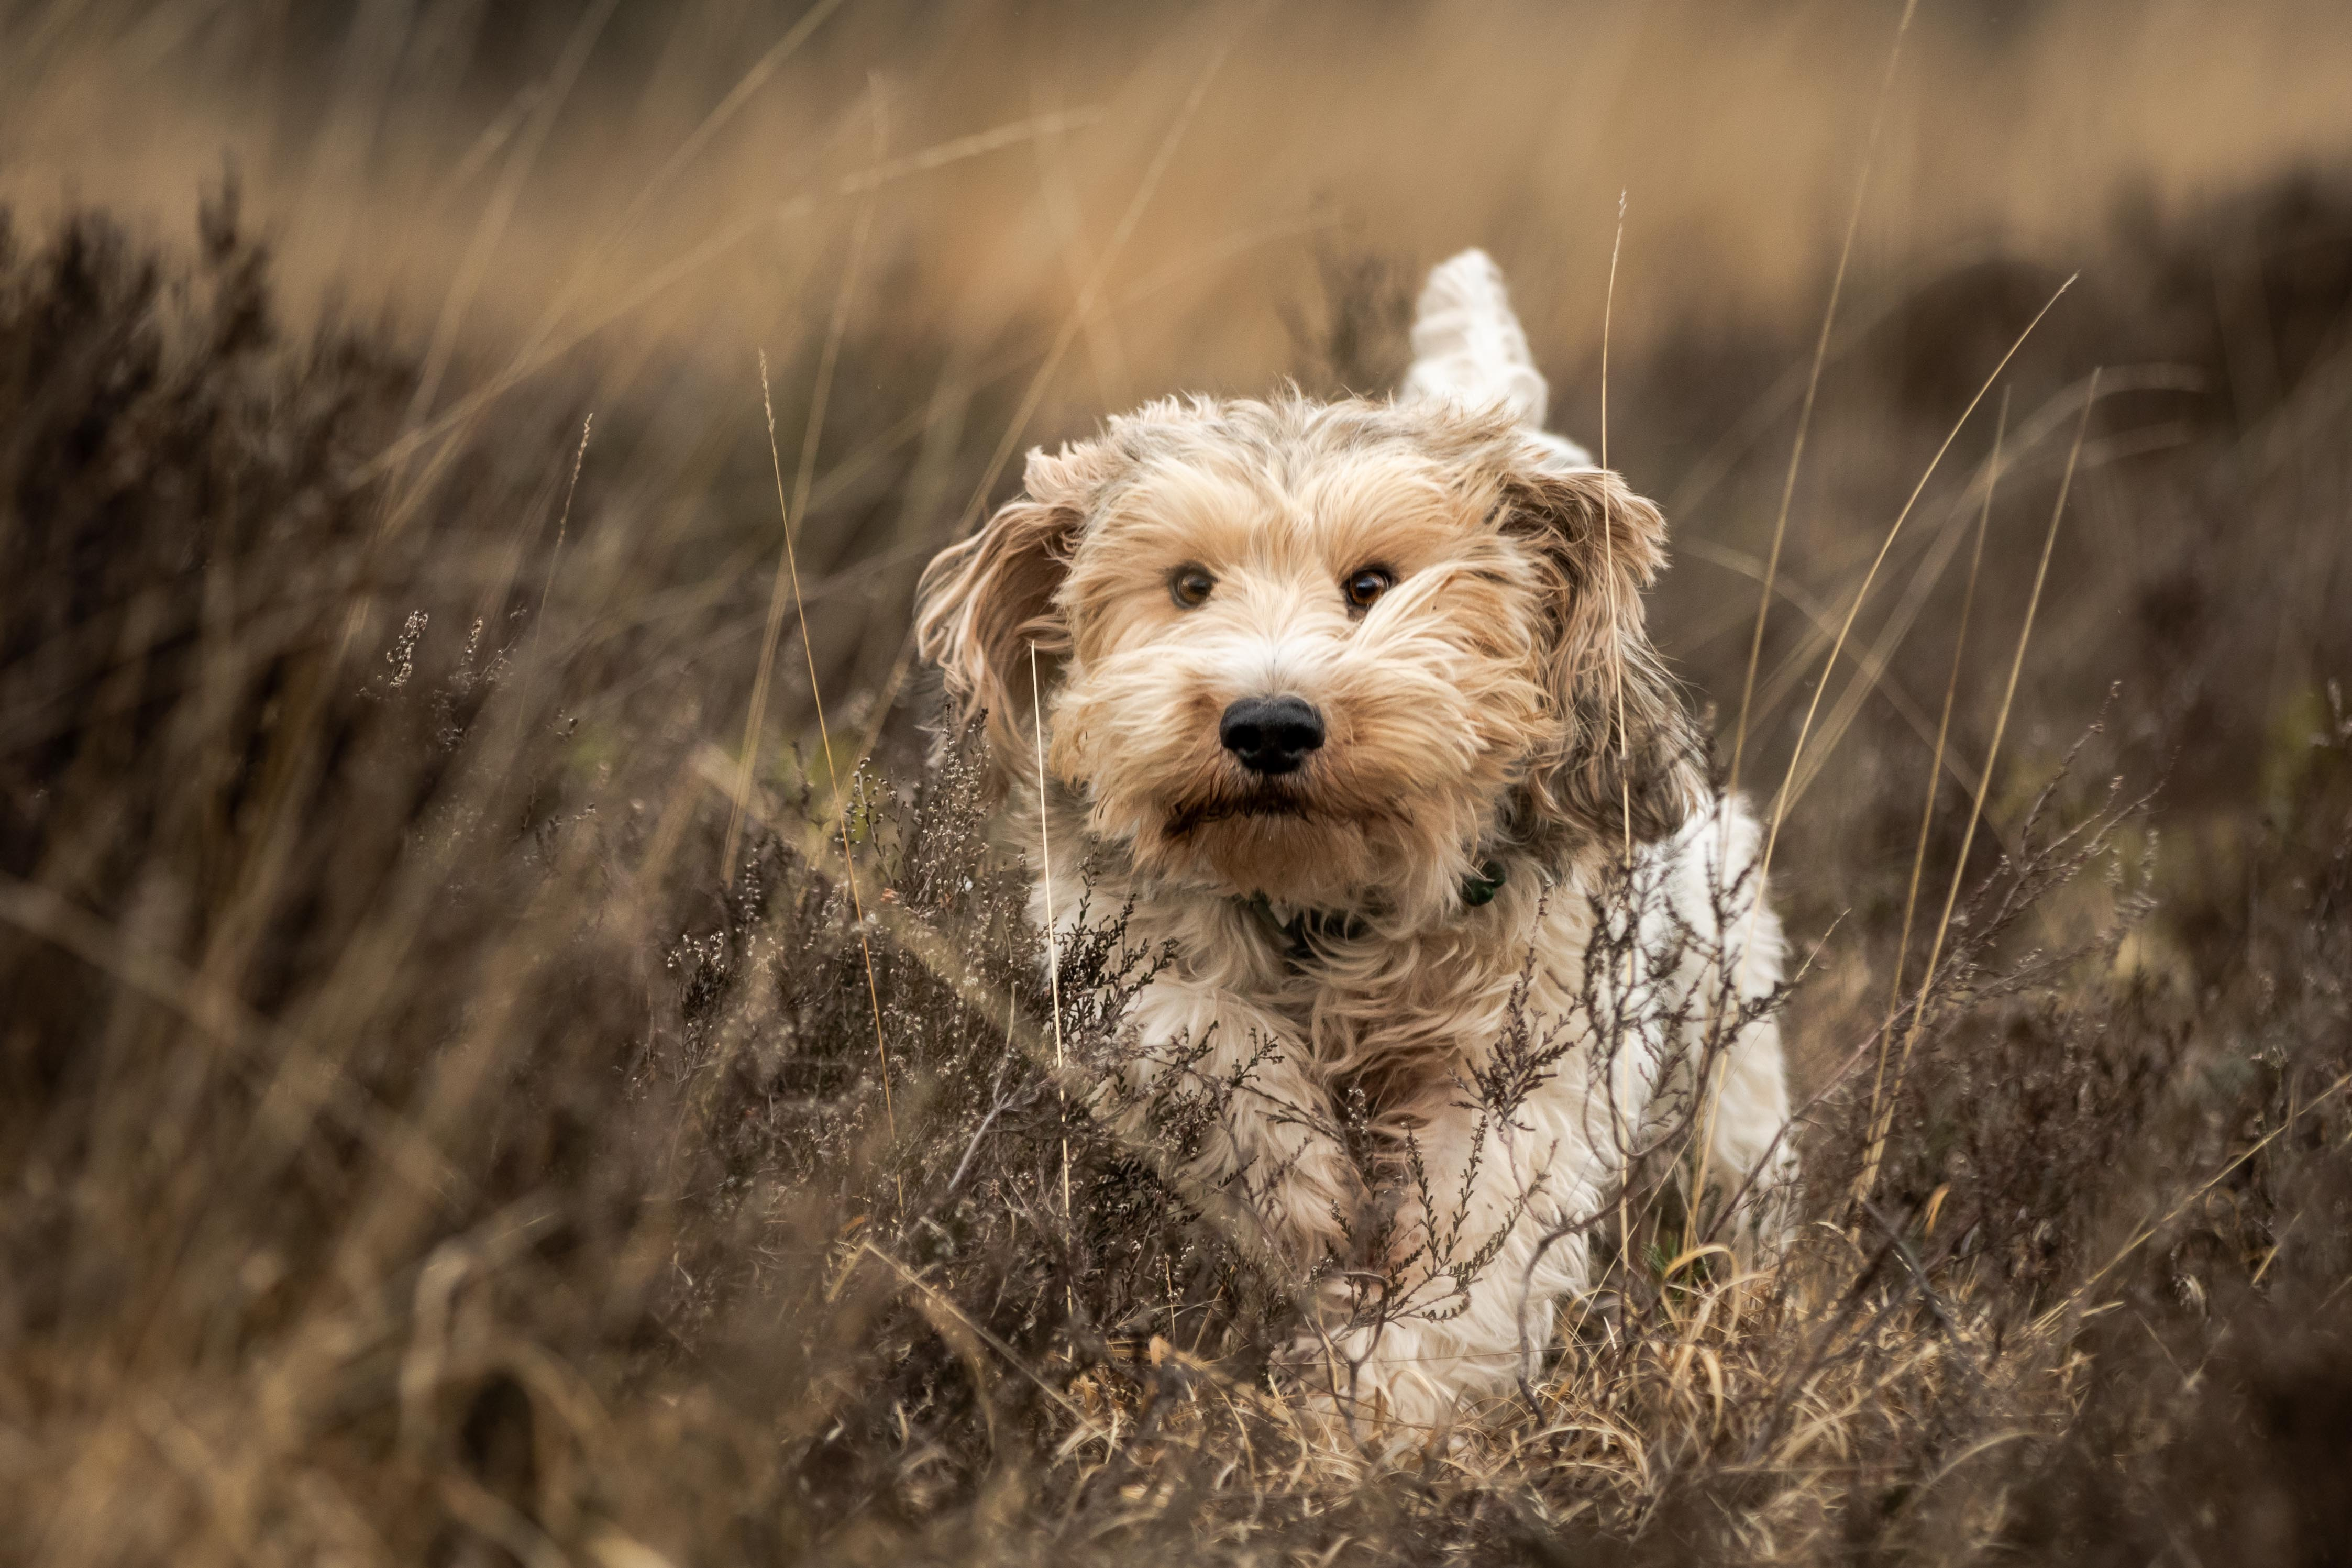 Marleen Verheul Fotografie, hondenfotografie, hondenfotograaf, Grand basset Griffon vendéen